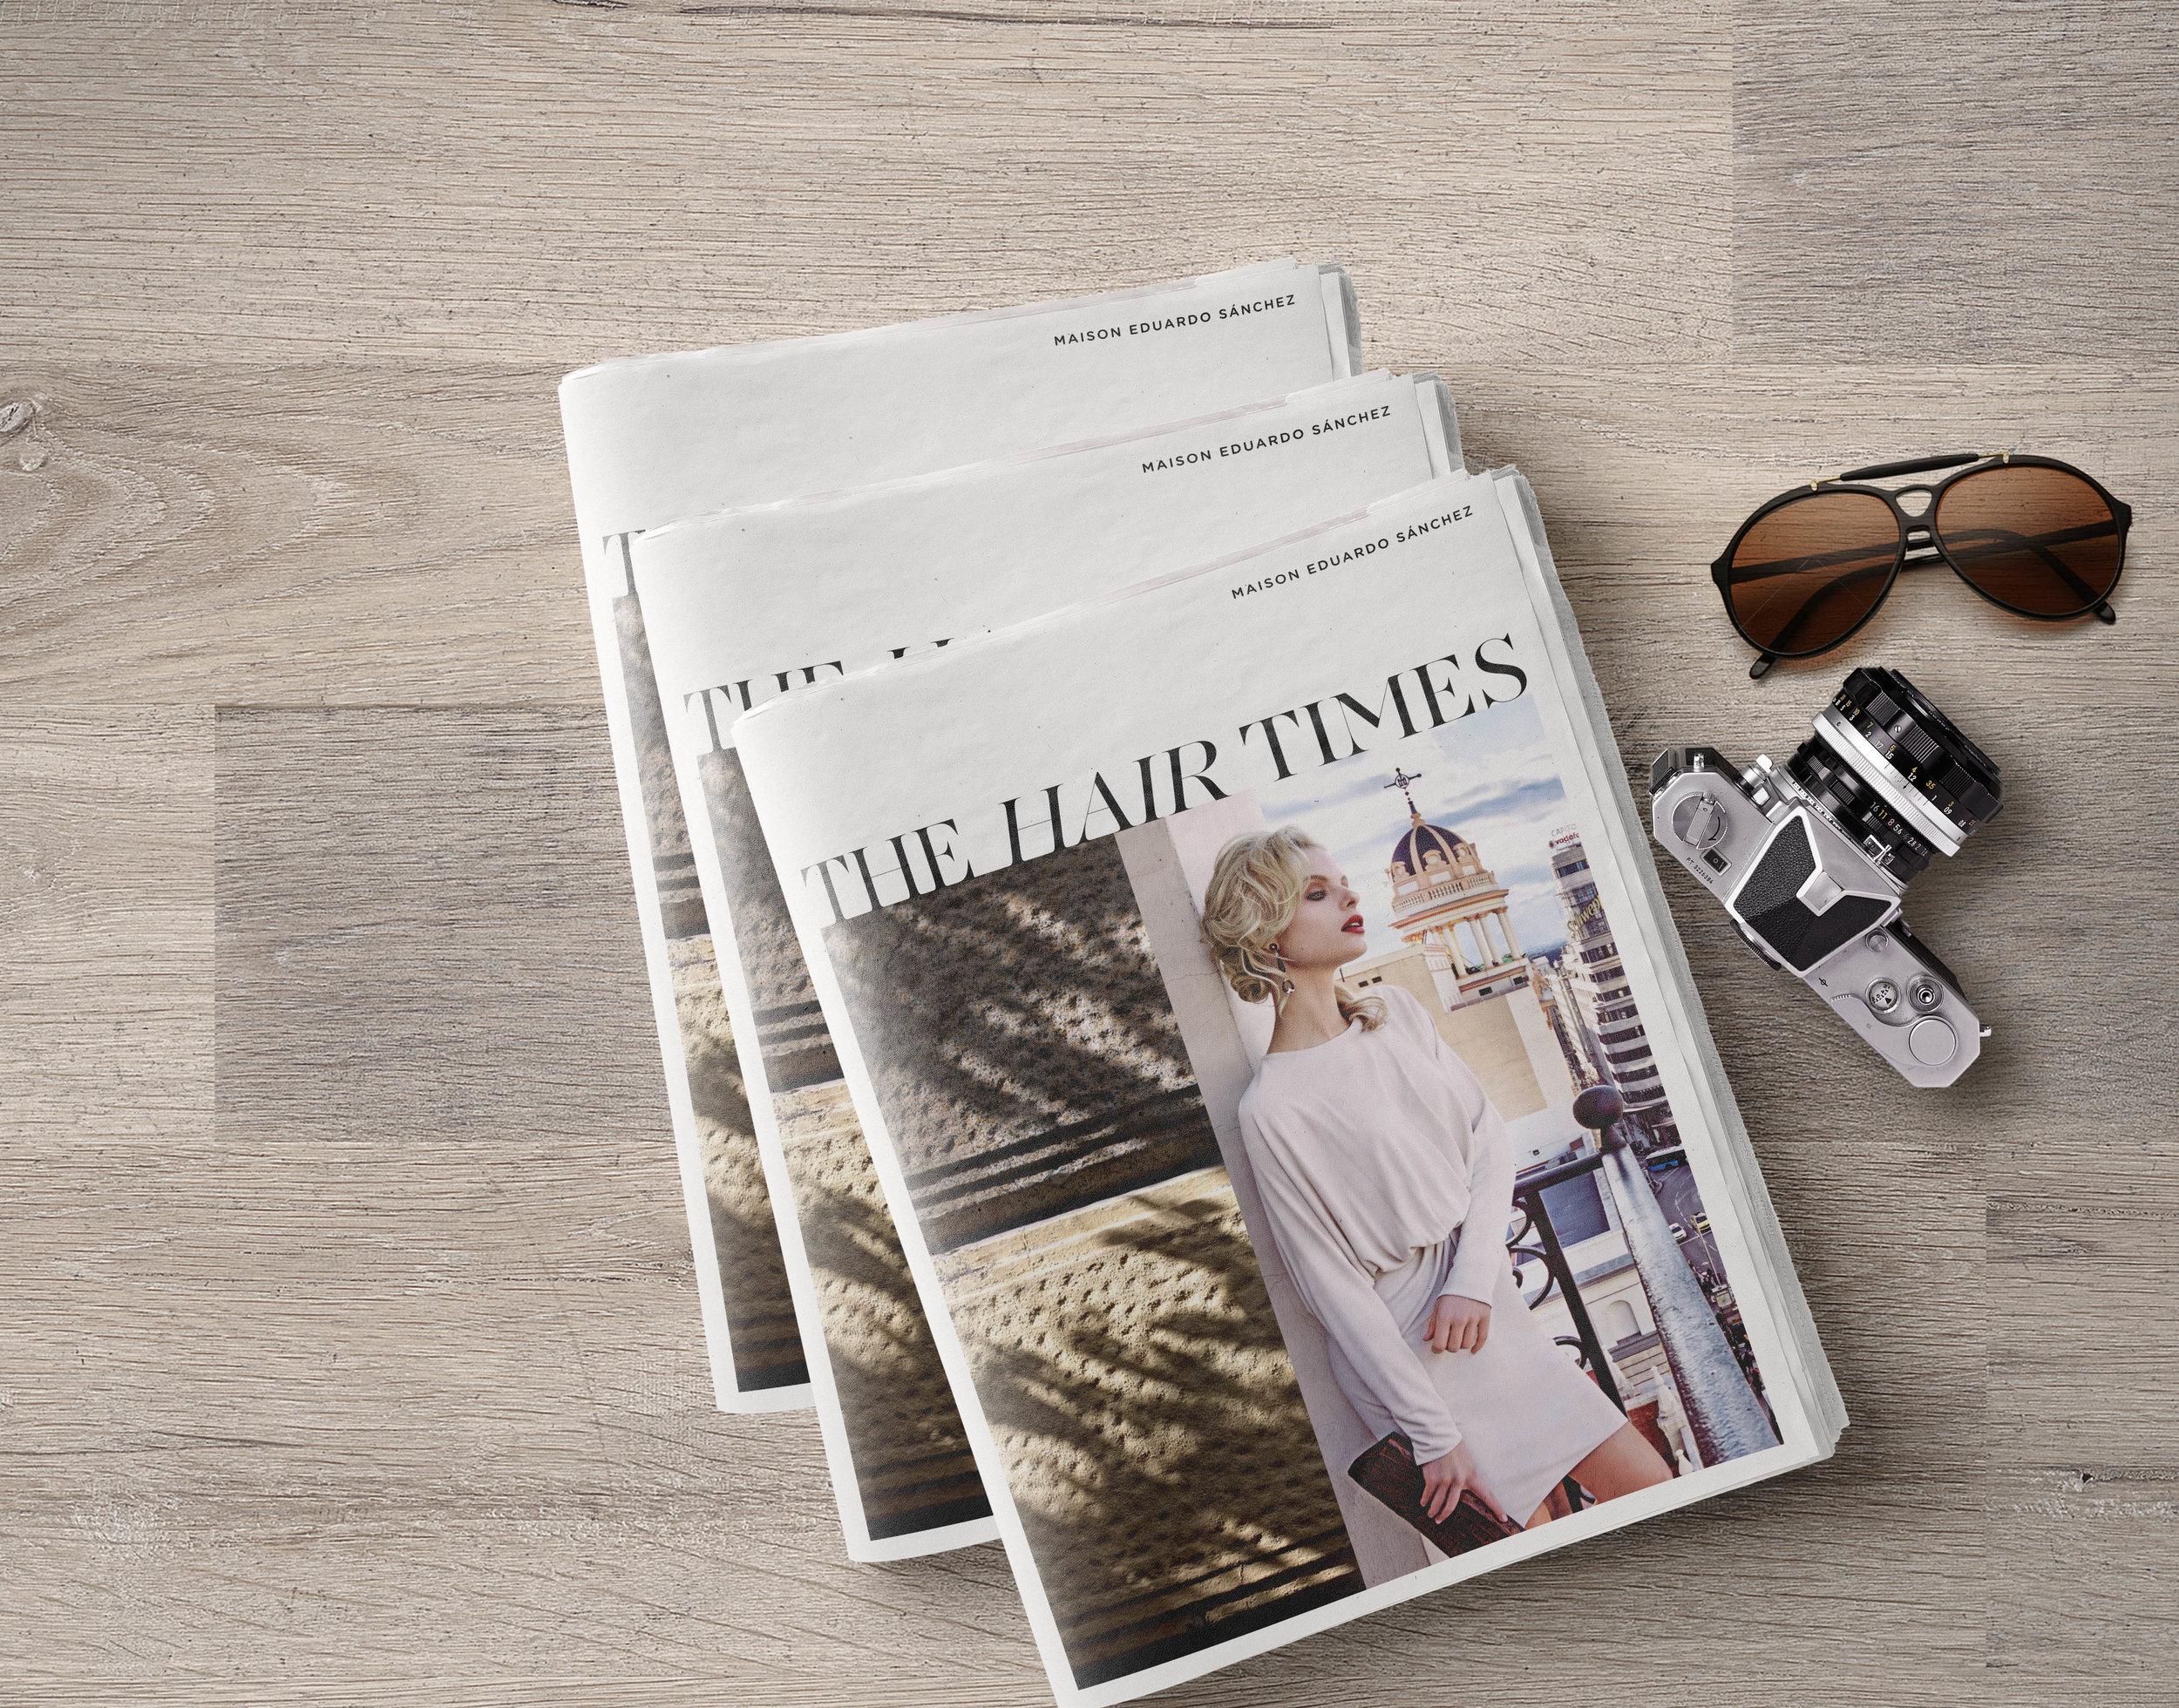 001-Daily-News-Cover-Mockup 2.jpg